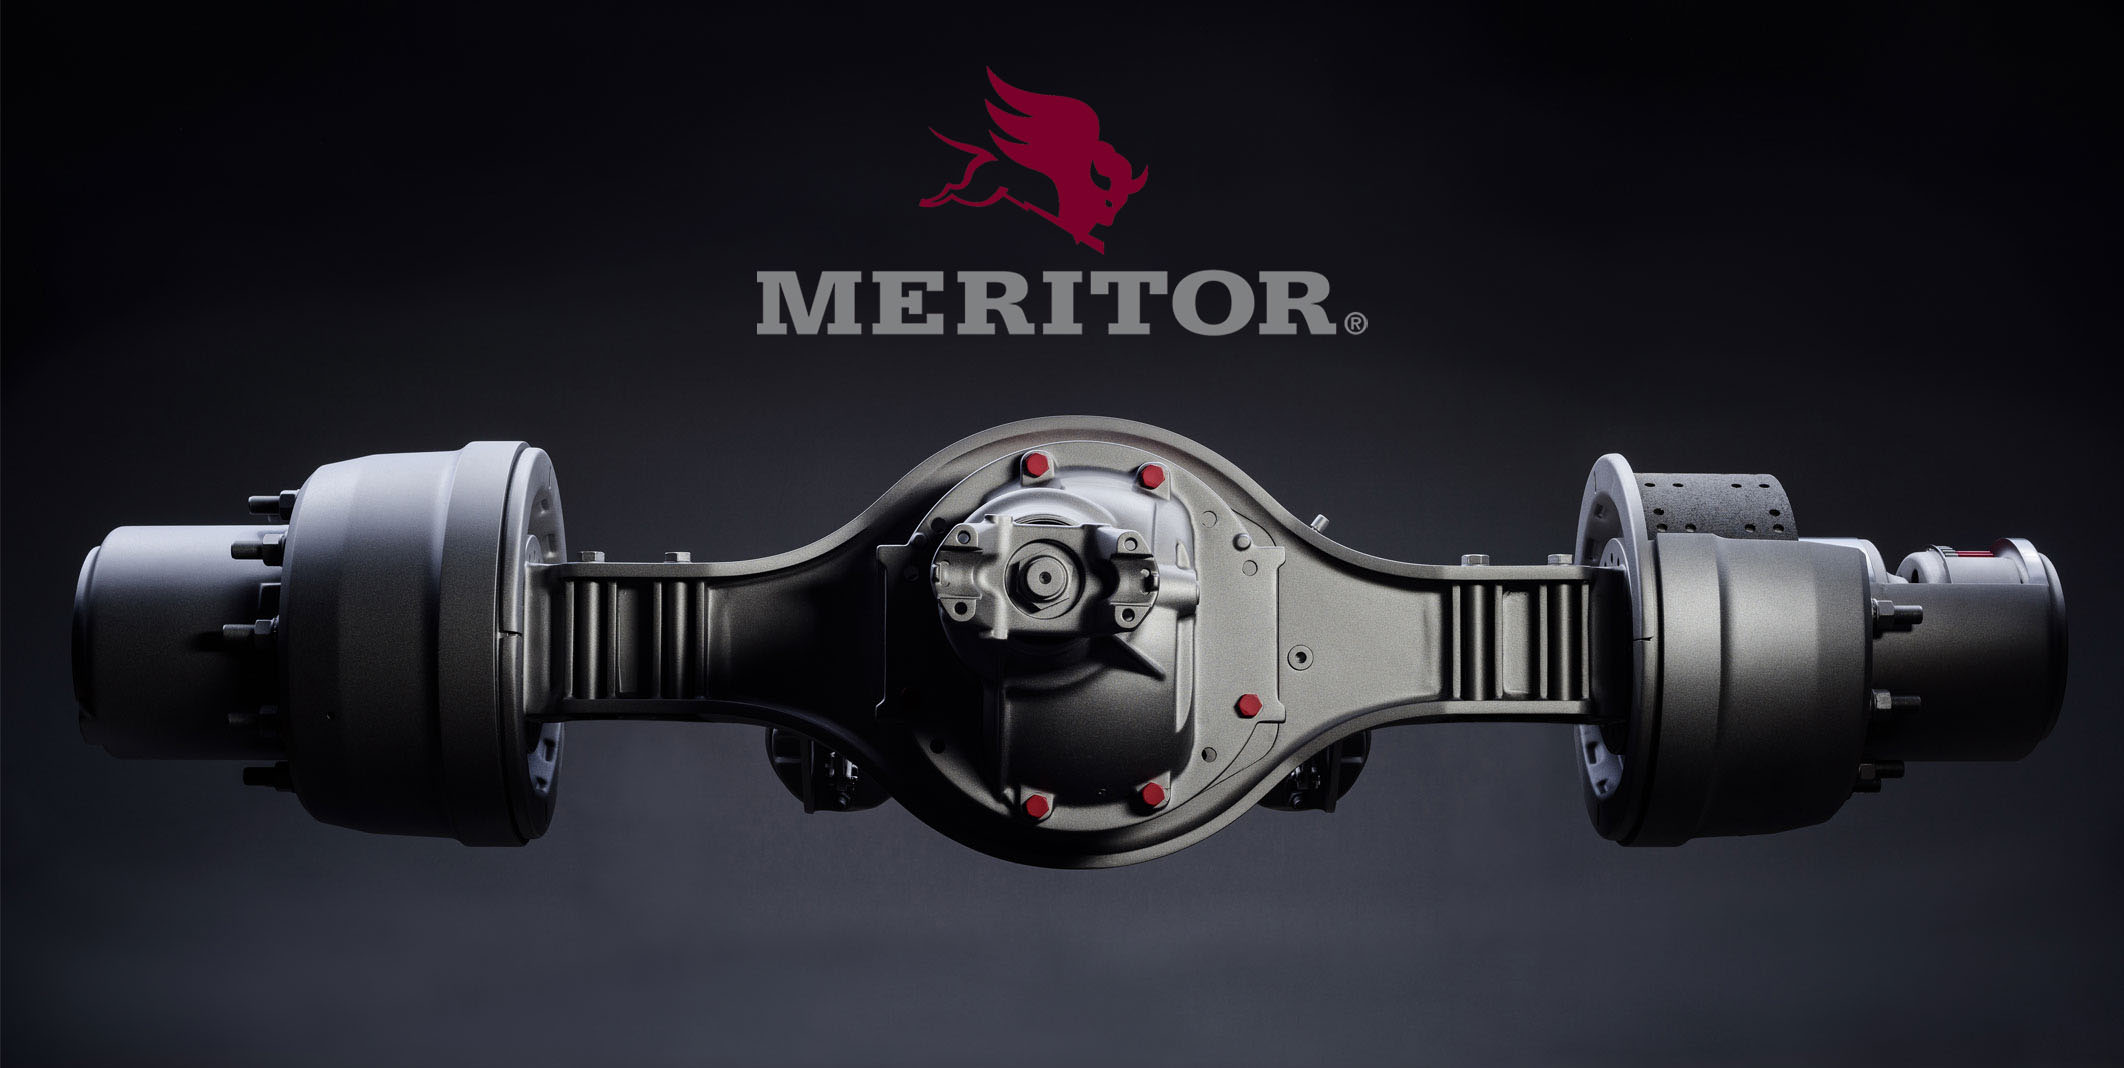 Trục Dẫn động Meritor